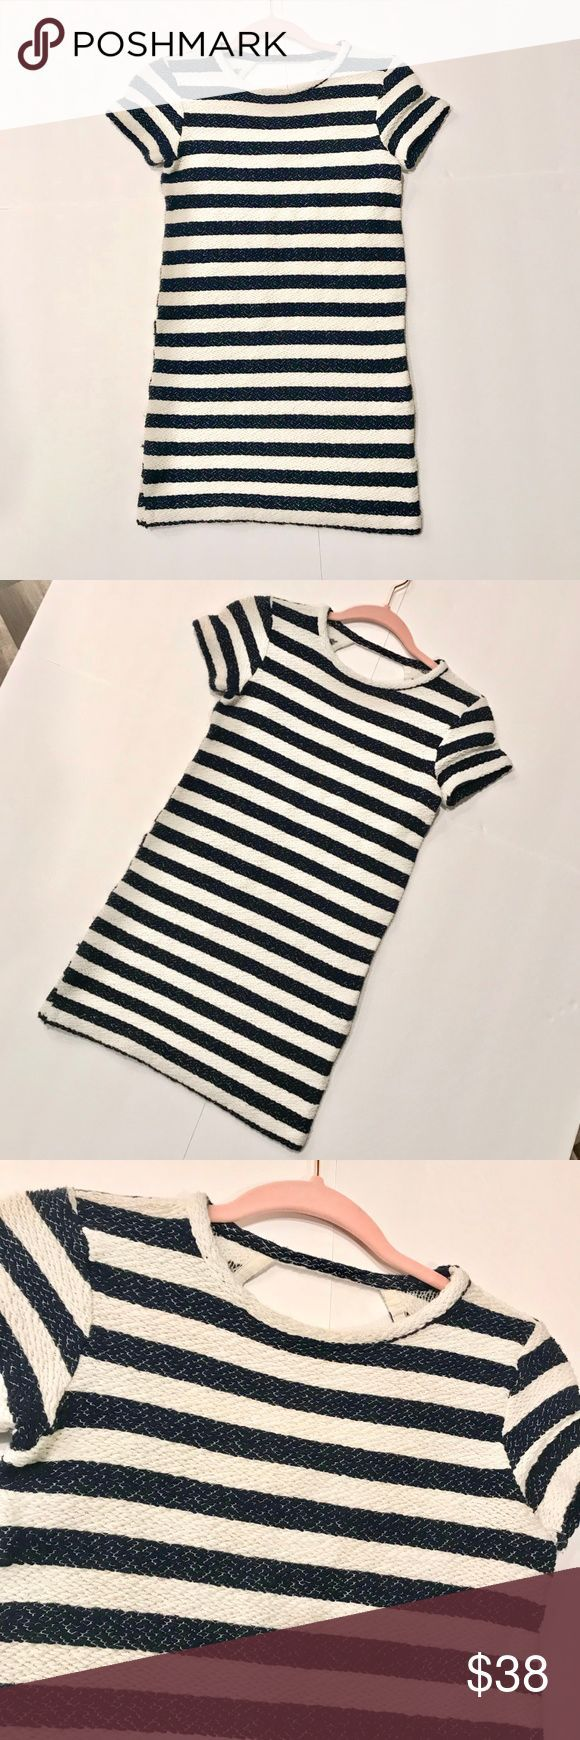 596270f7 Zara | Striped Knit Mini Dress This Zara Trafaluc dress is stunning and  comfortable. Features